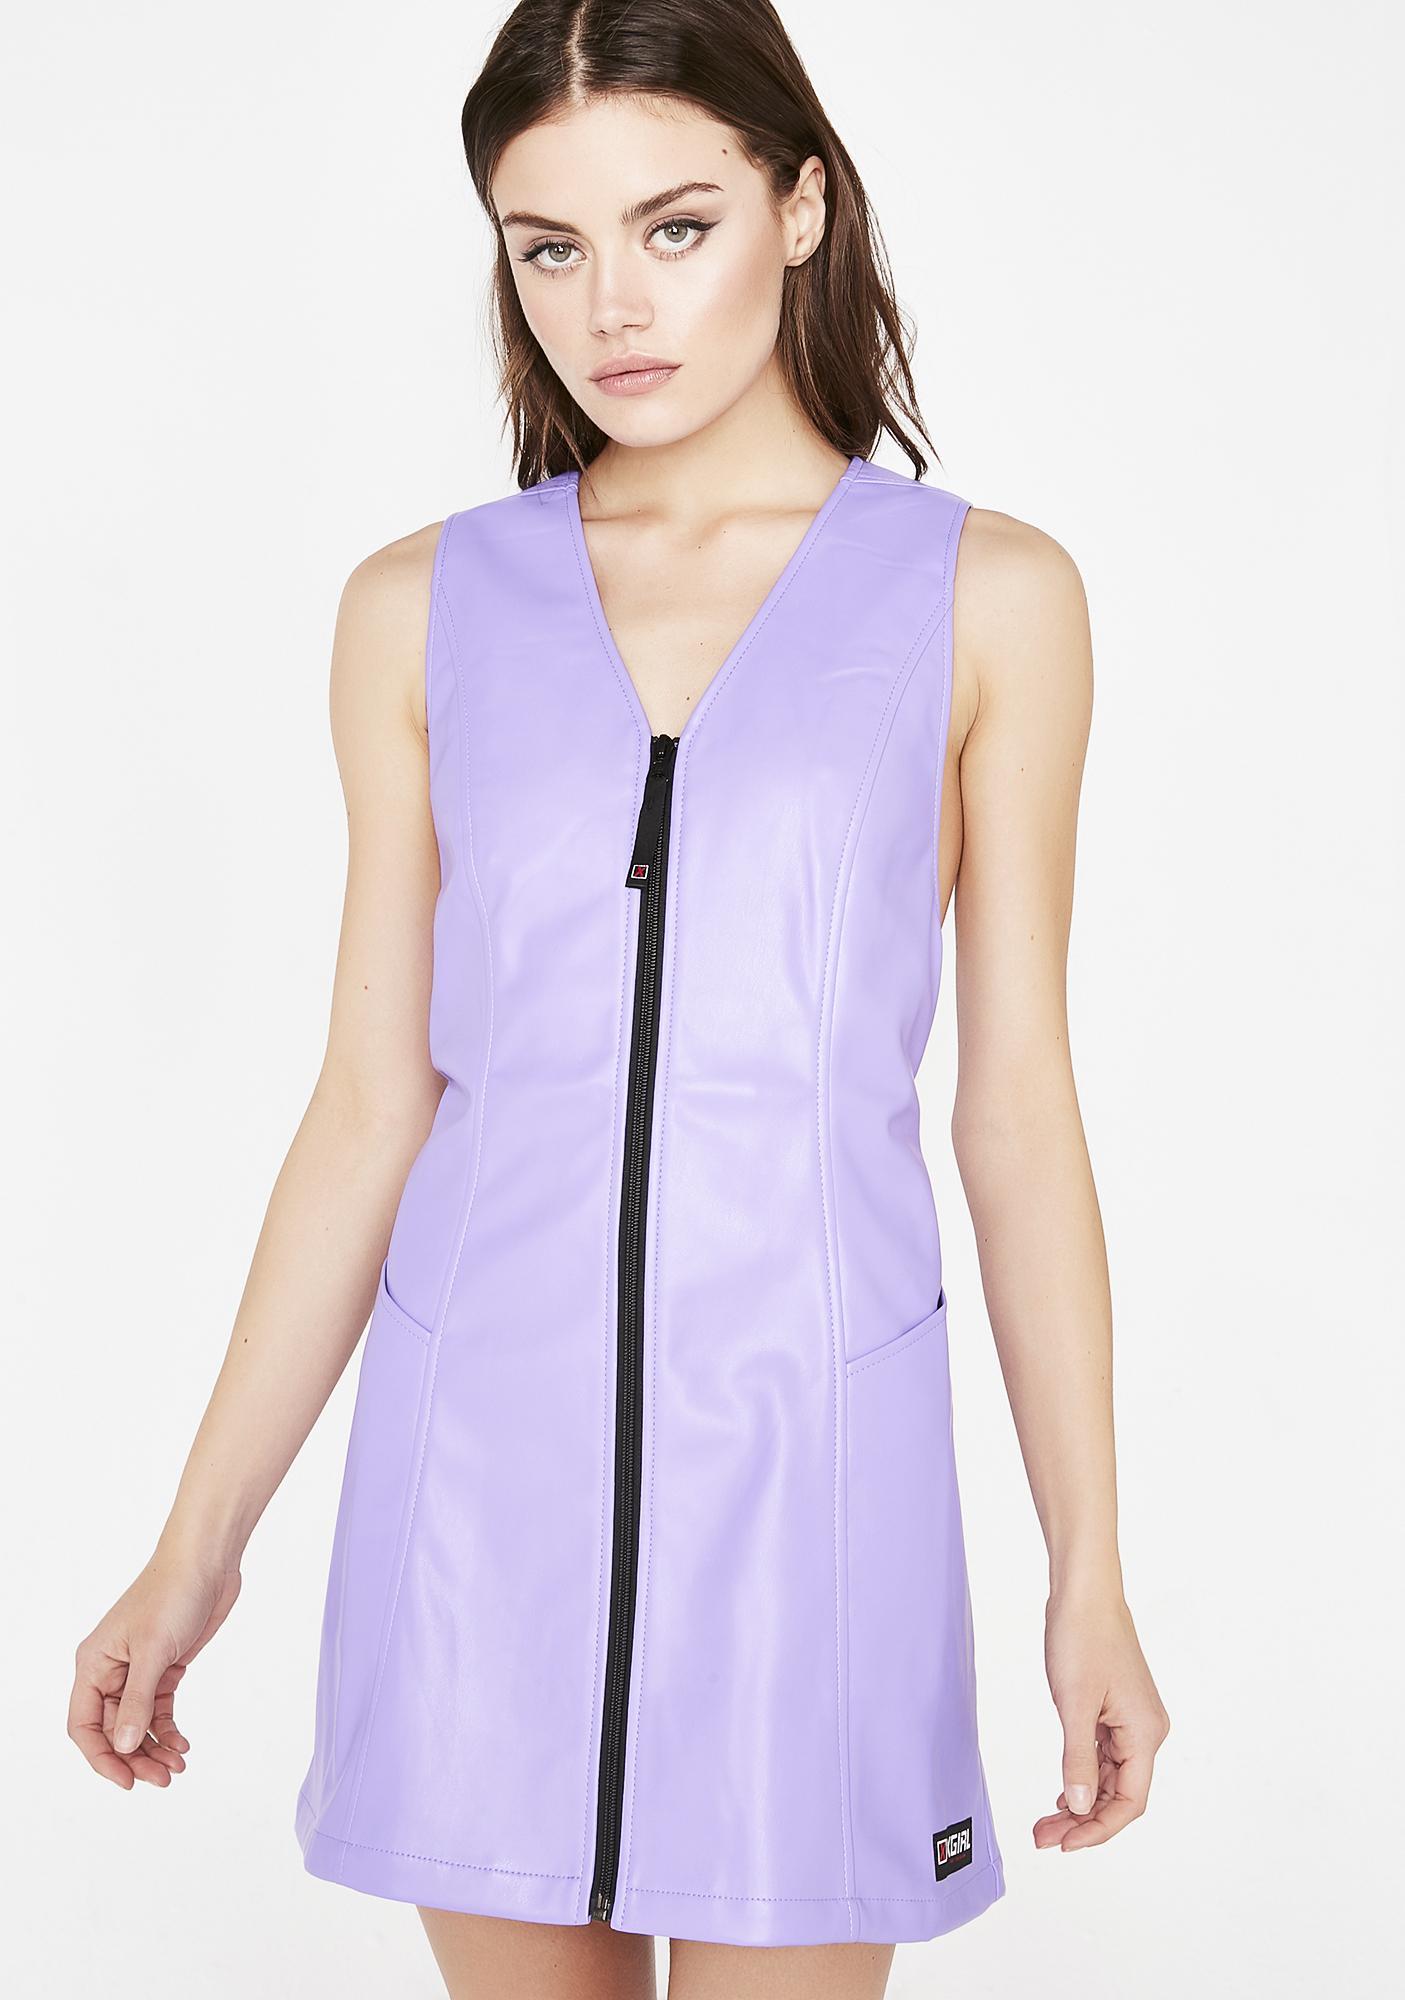 x-Girl Vegan Leather Retro Dress